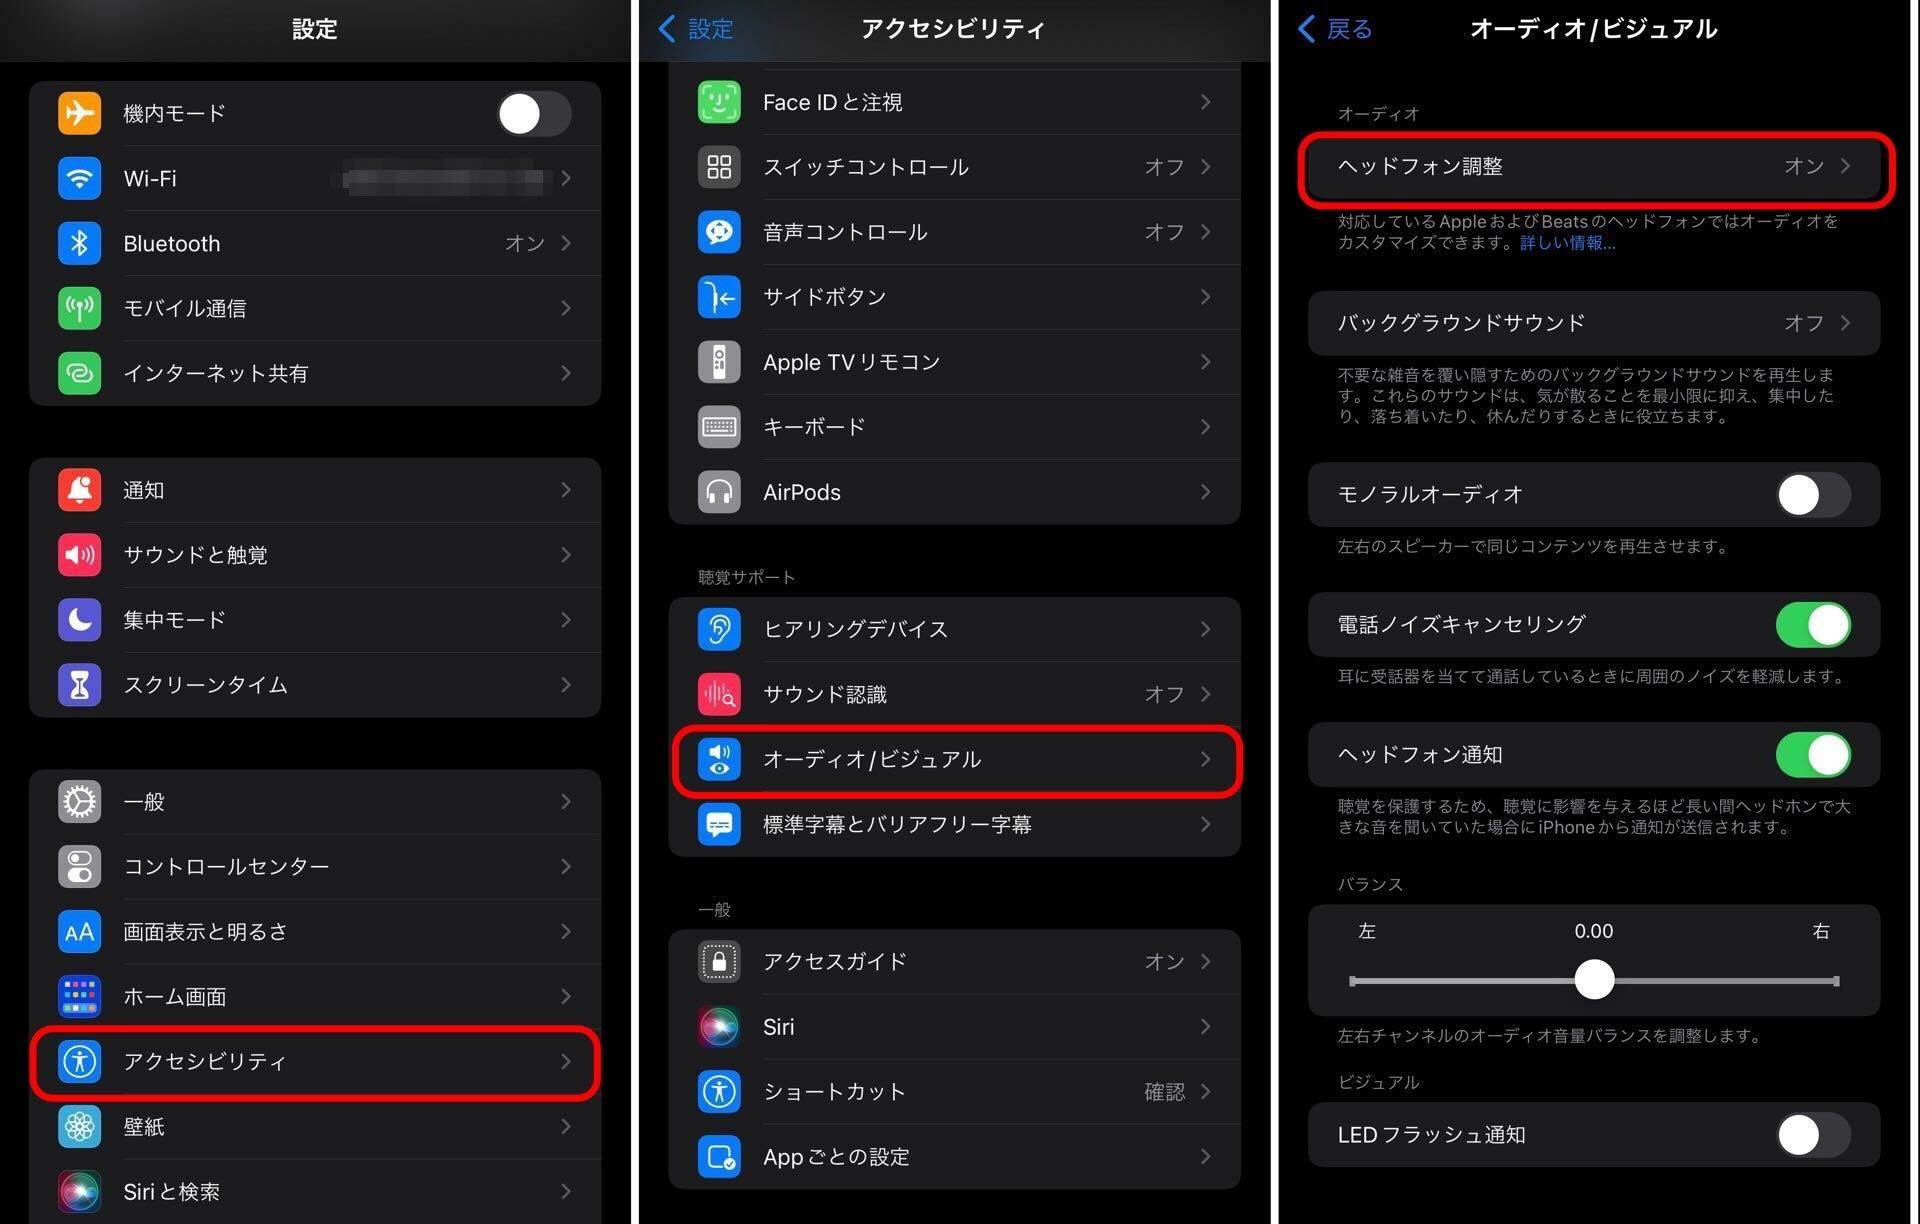 iOS 15 AirPods settings